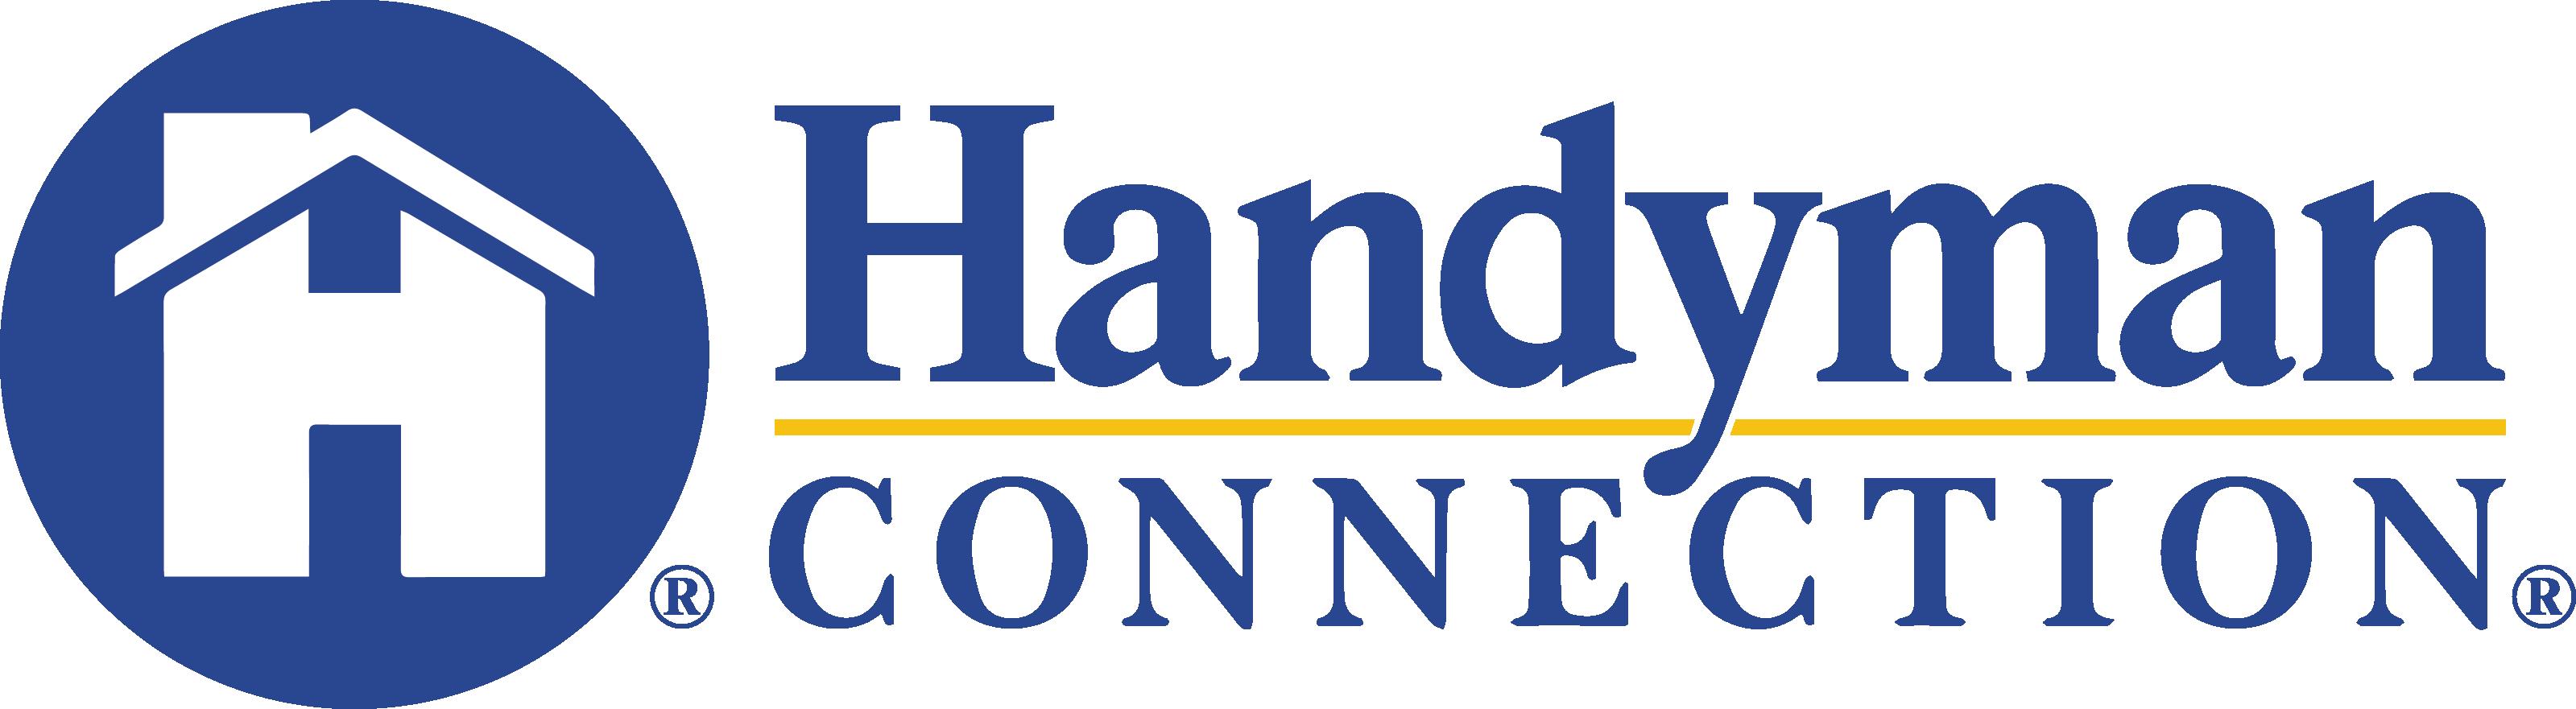 Handyman Connection of Northwest Arkansas, AR